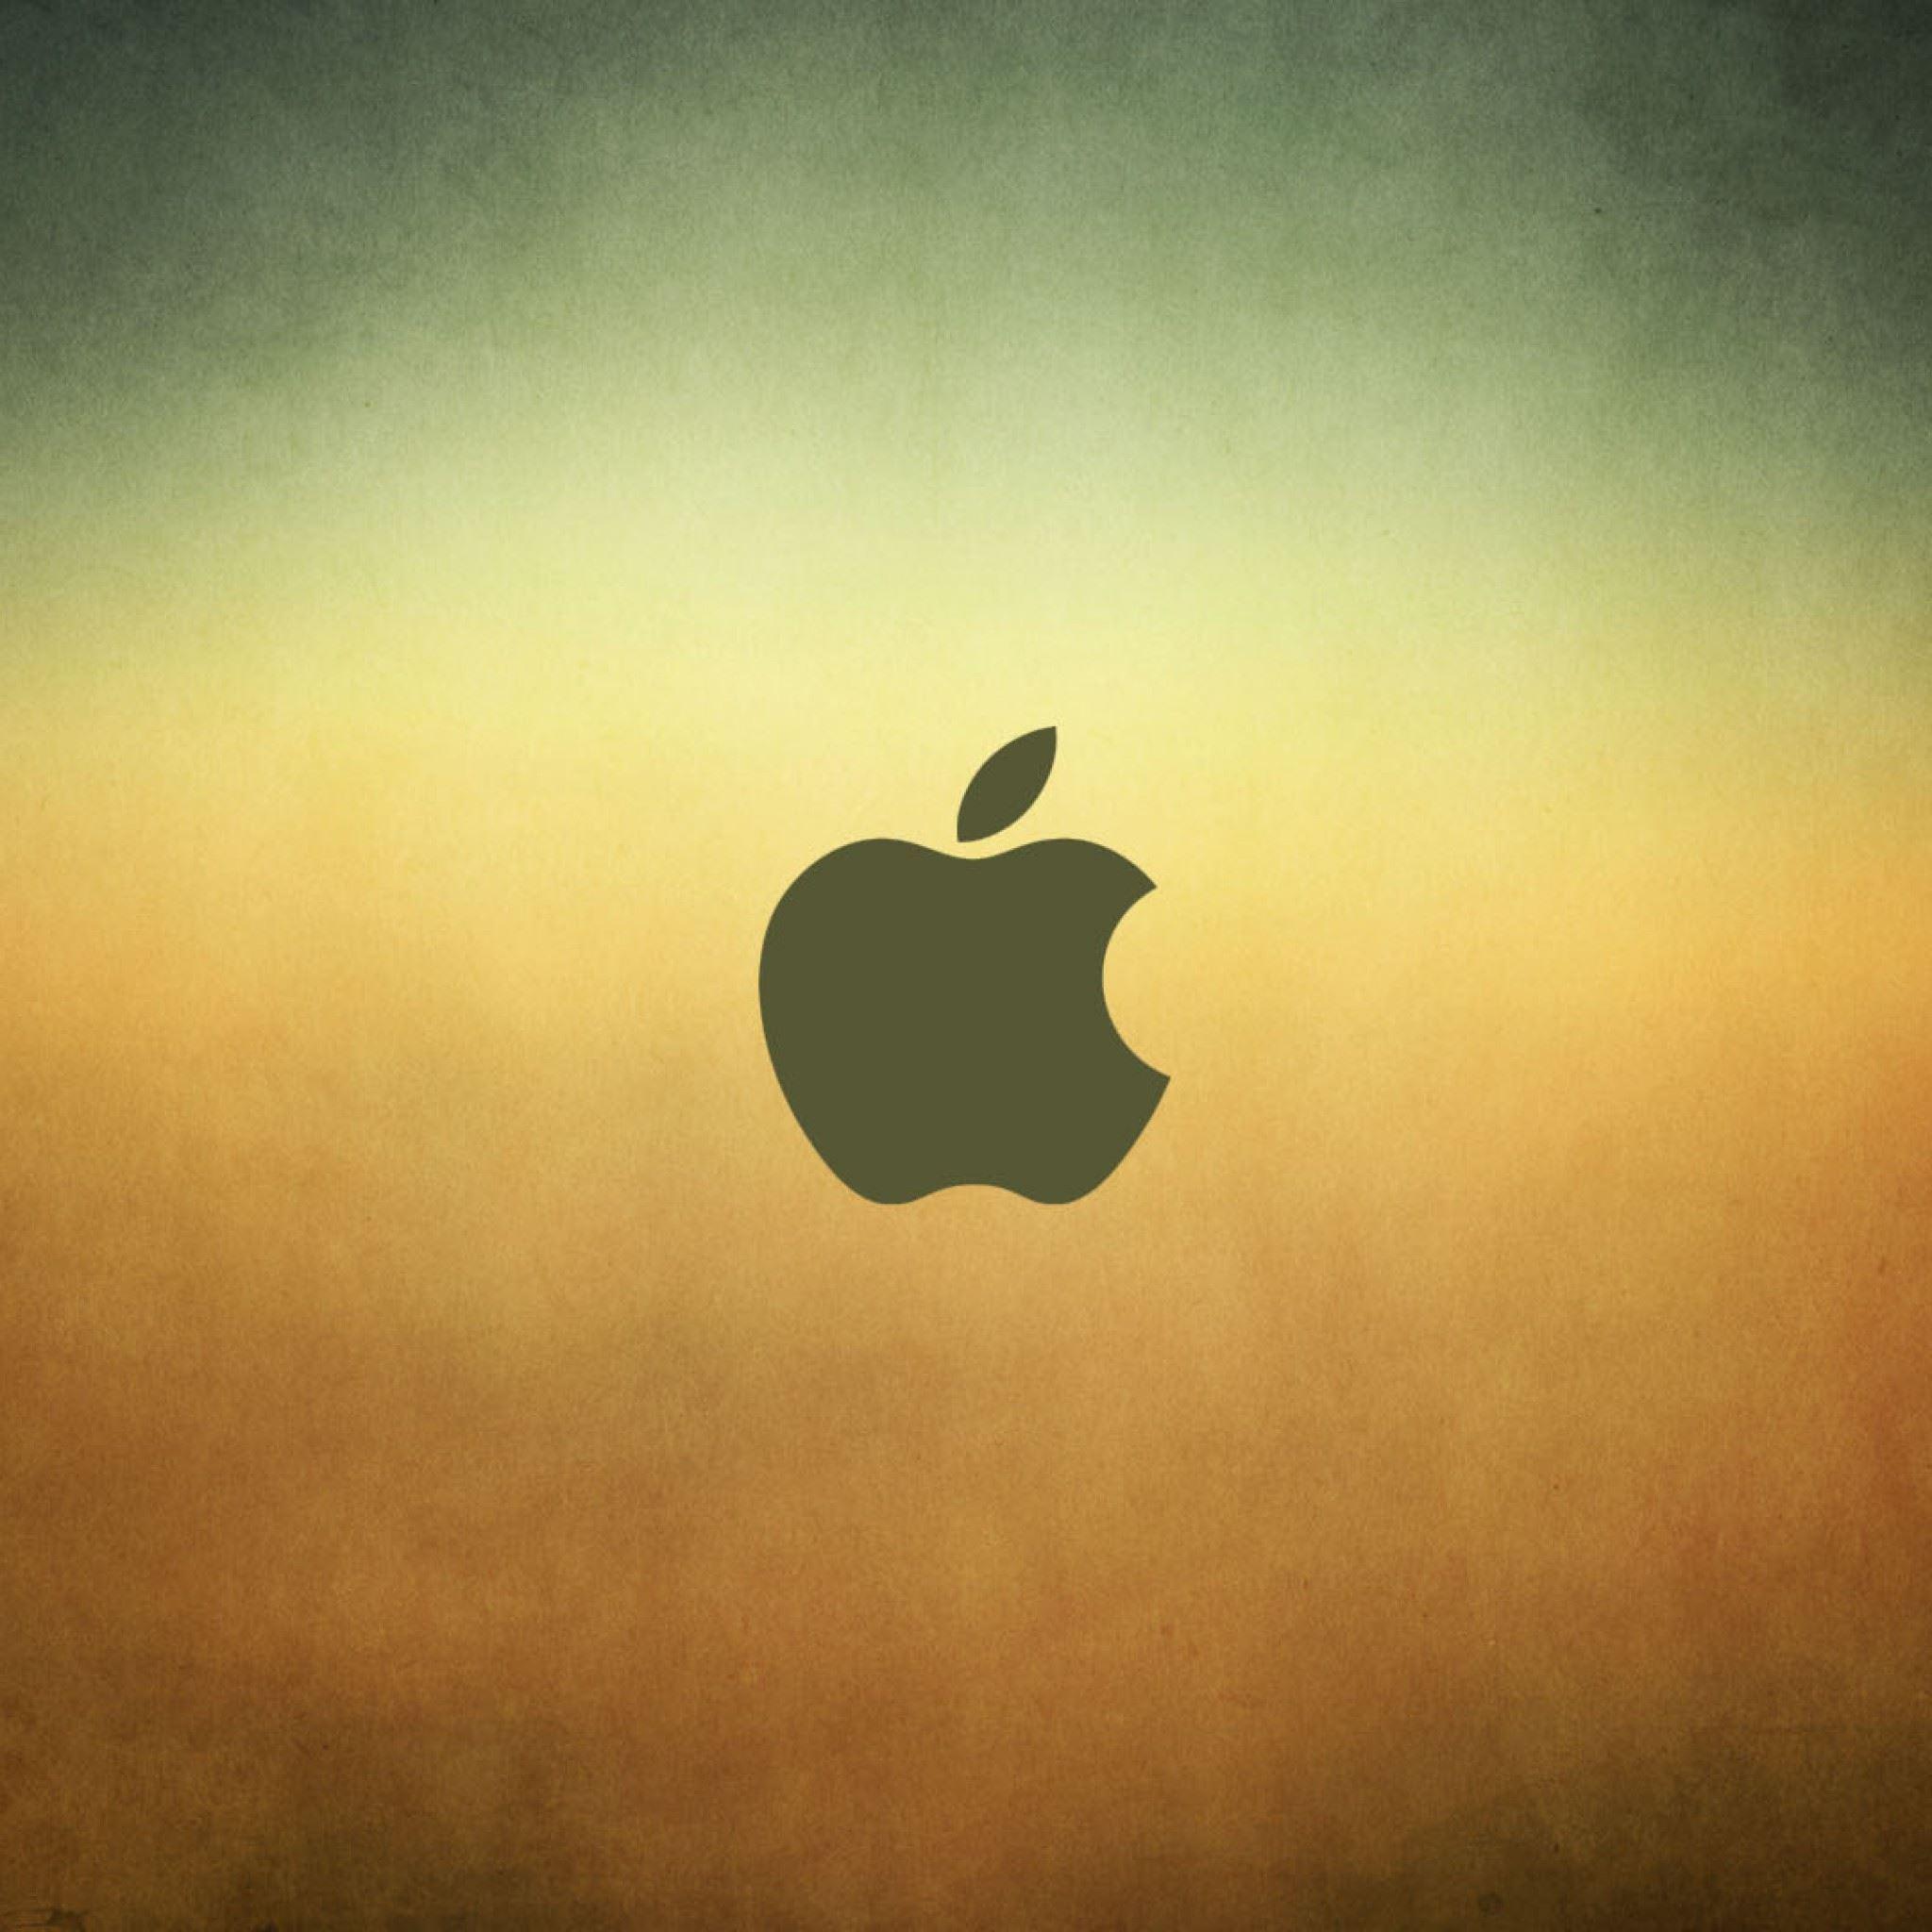 Apple Hd IPad Air Wallpaper Download